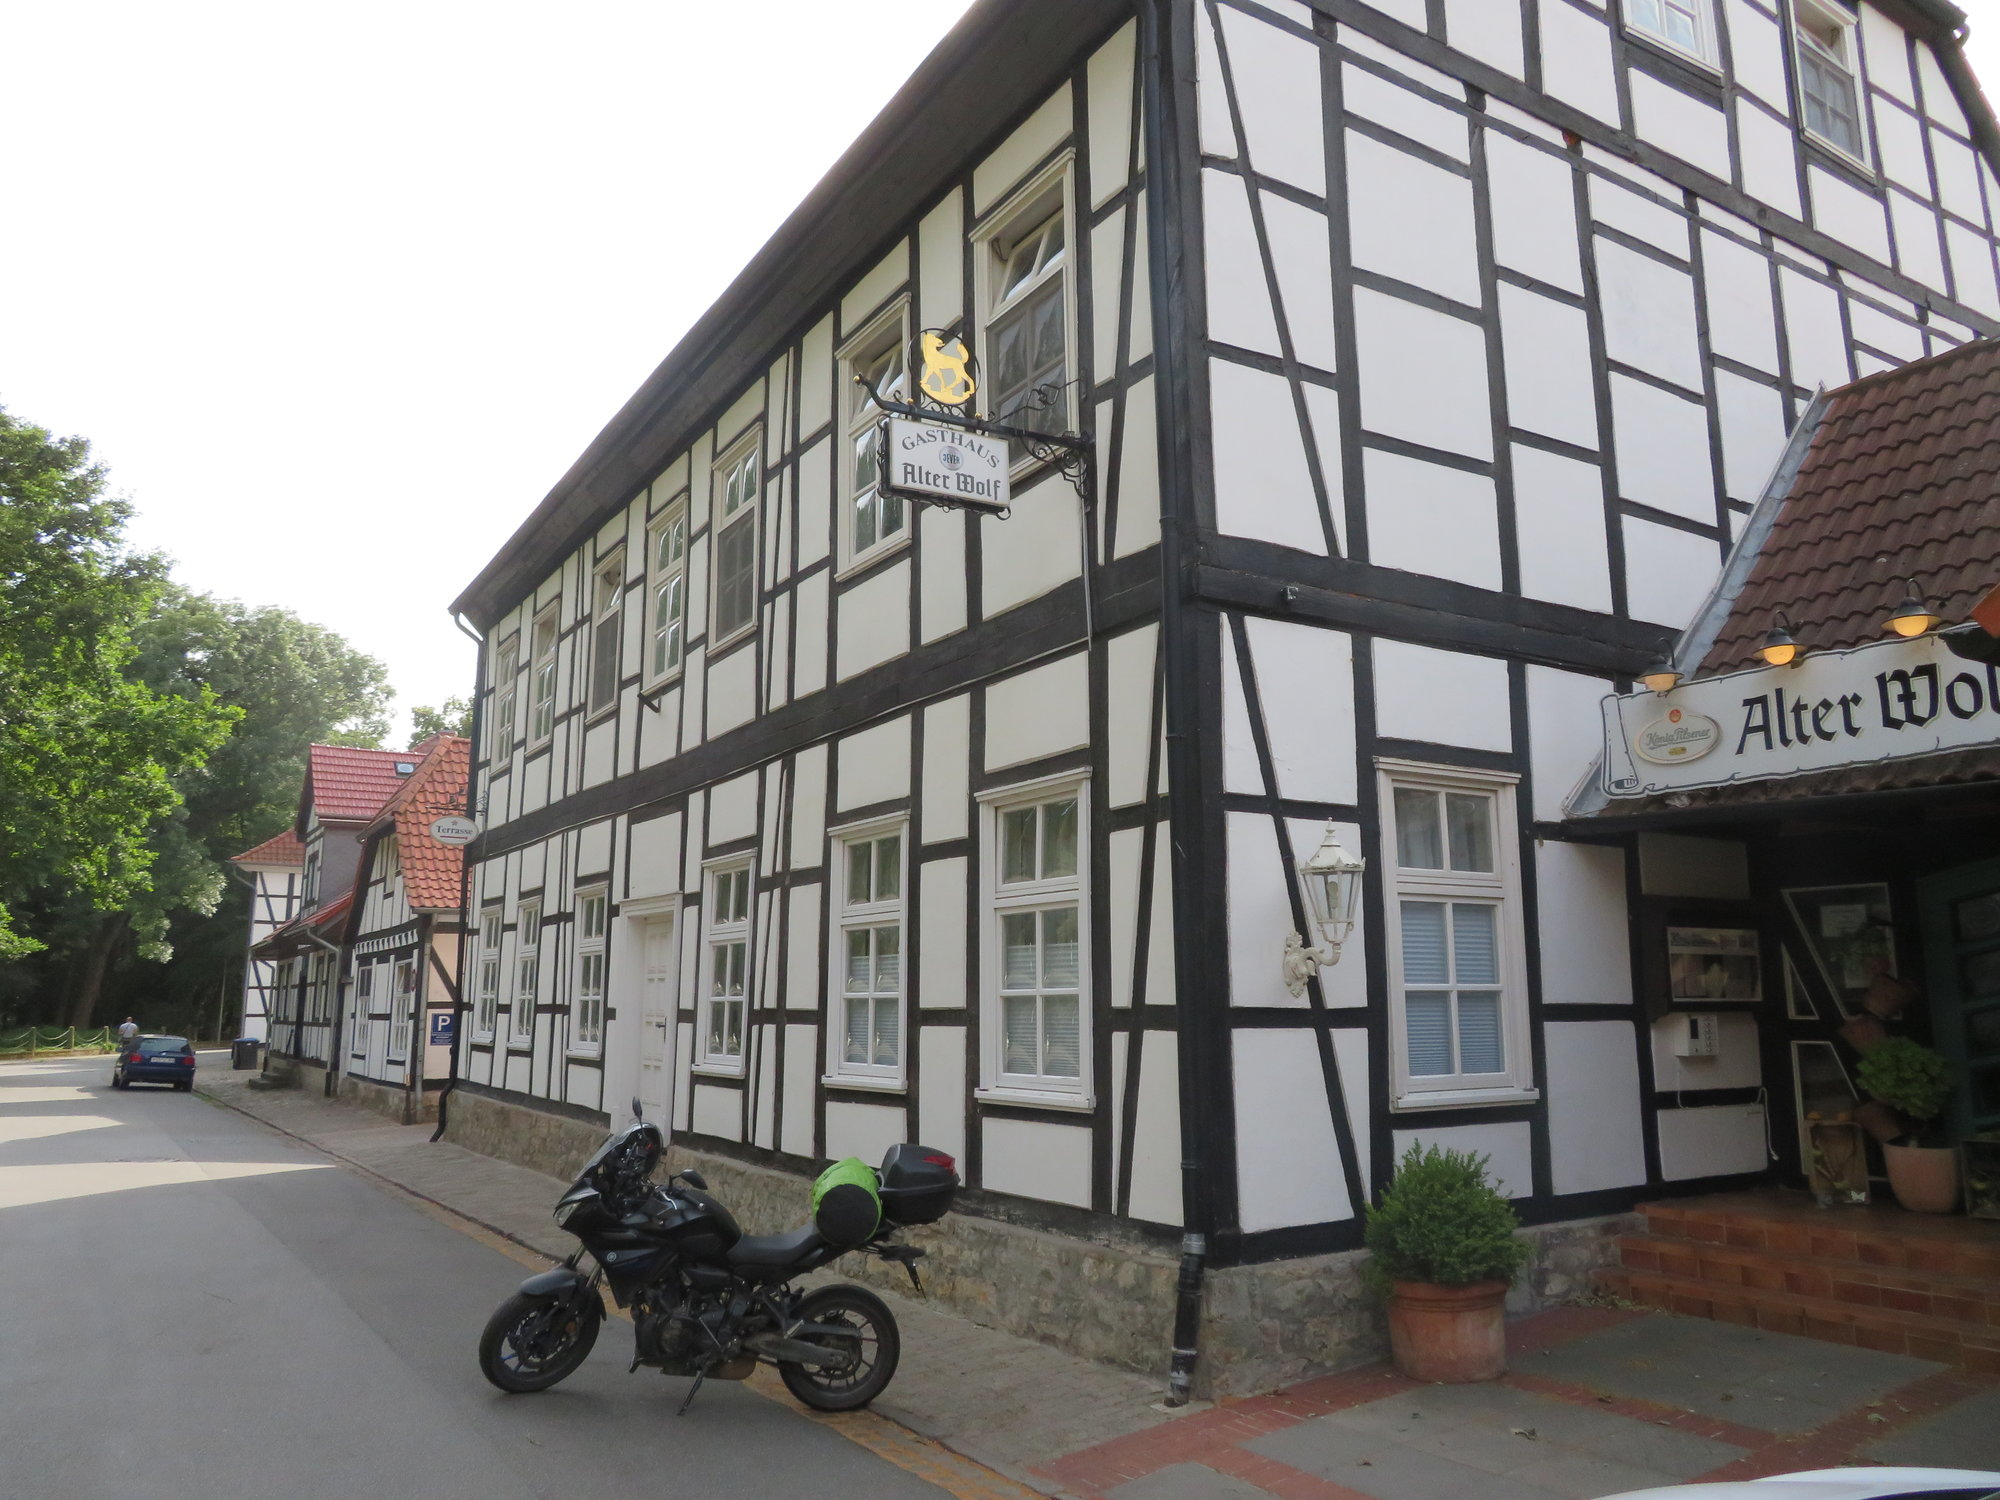 2019-07-04 Alter Wolf Hotel,  Wolfsburg Germany  1.JPG